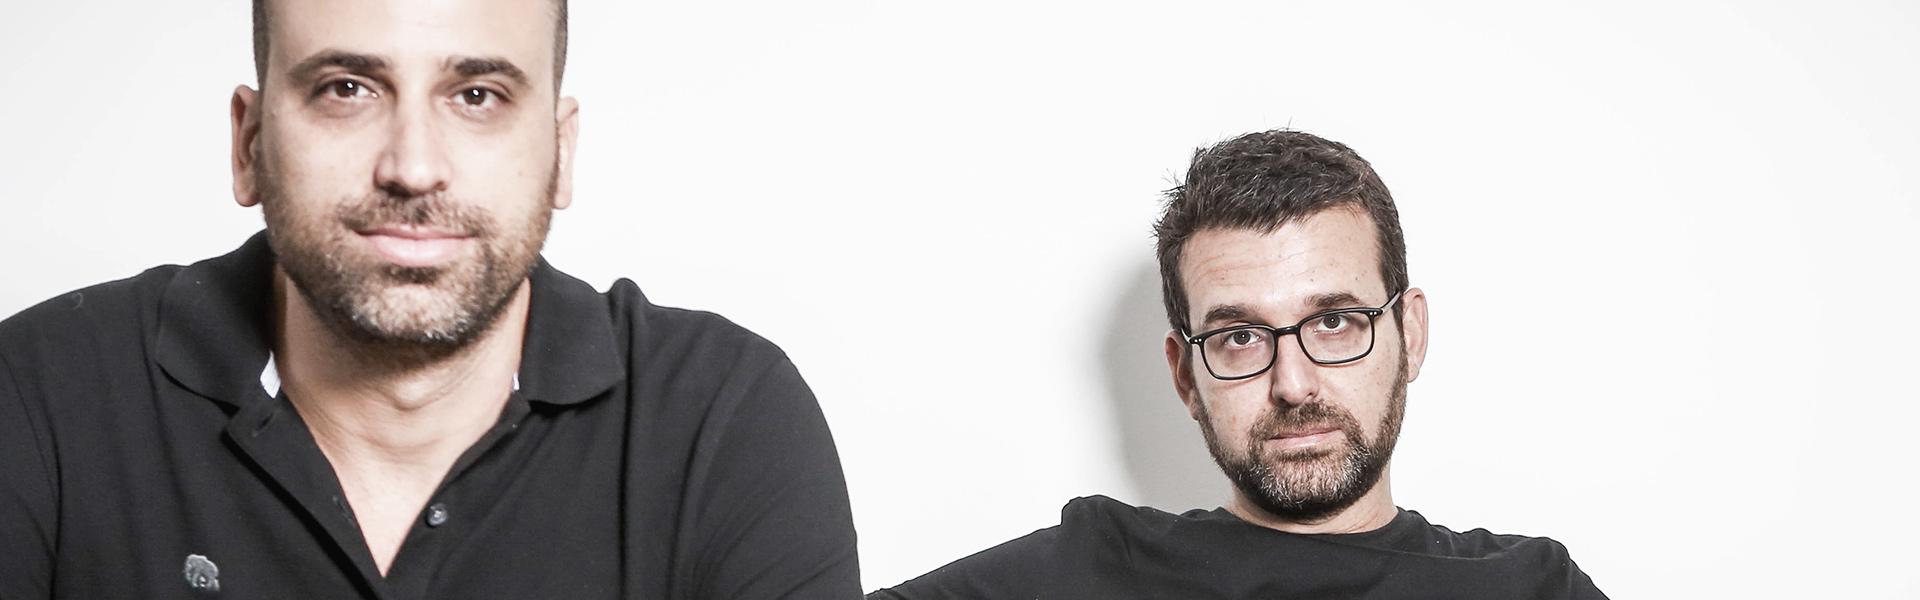 Promising Startups - datorama / צילום: שלומי יוסף